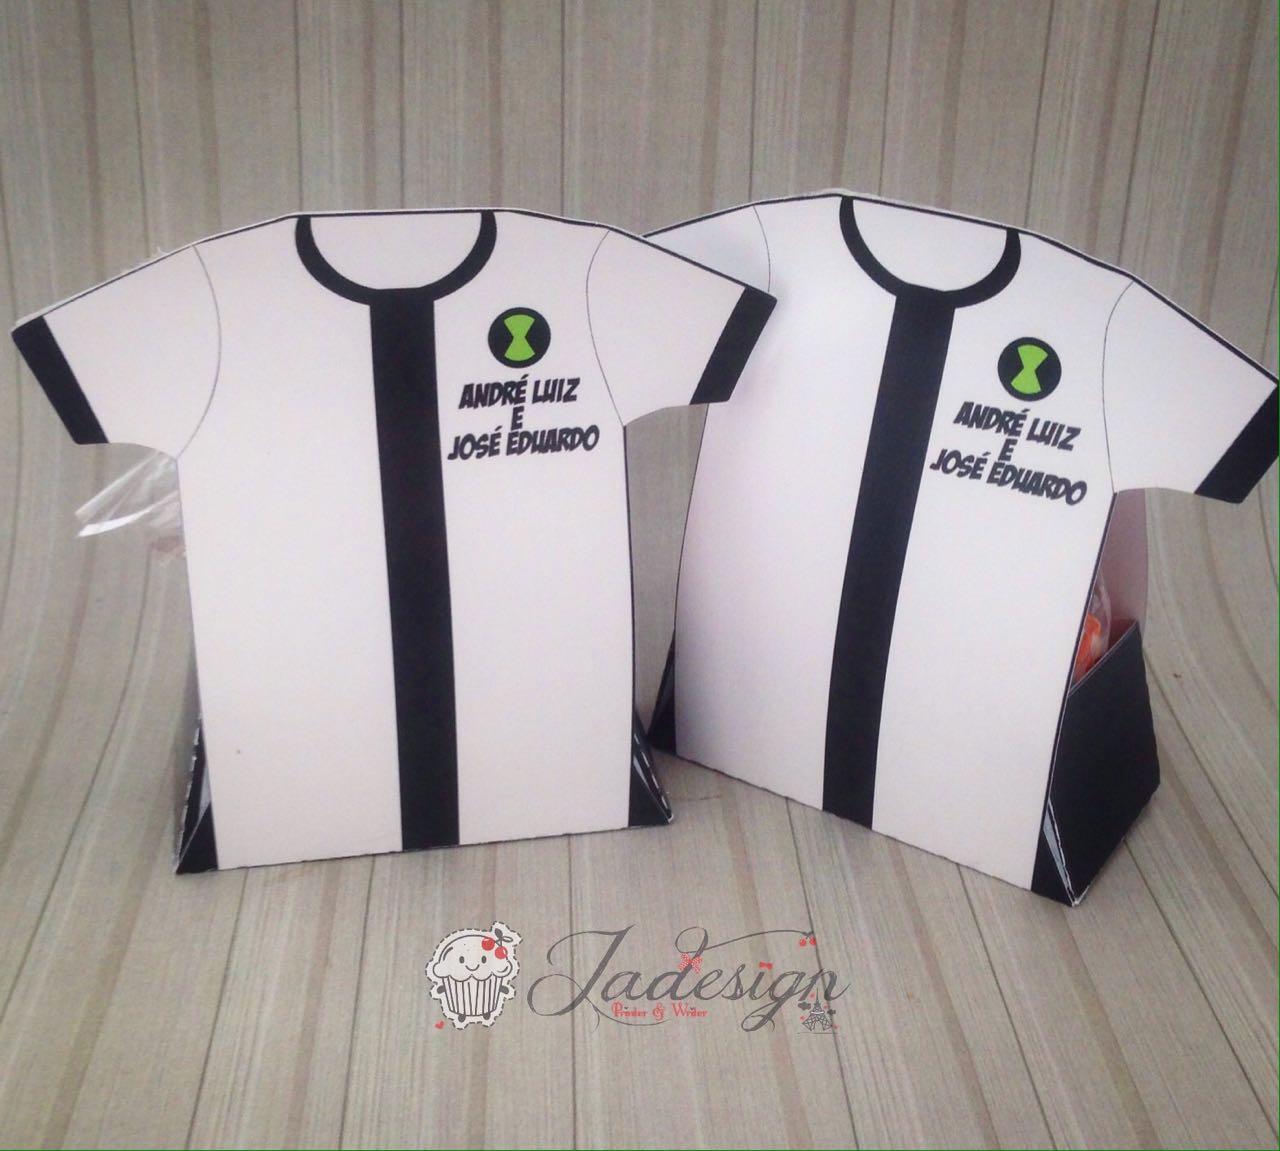 Caixa Camisa Molde para Imprimir  113f5b8fc7961